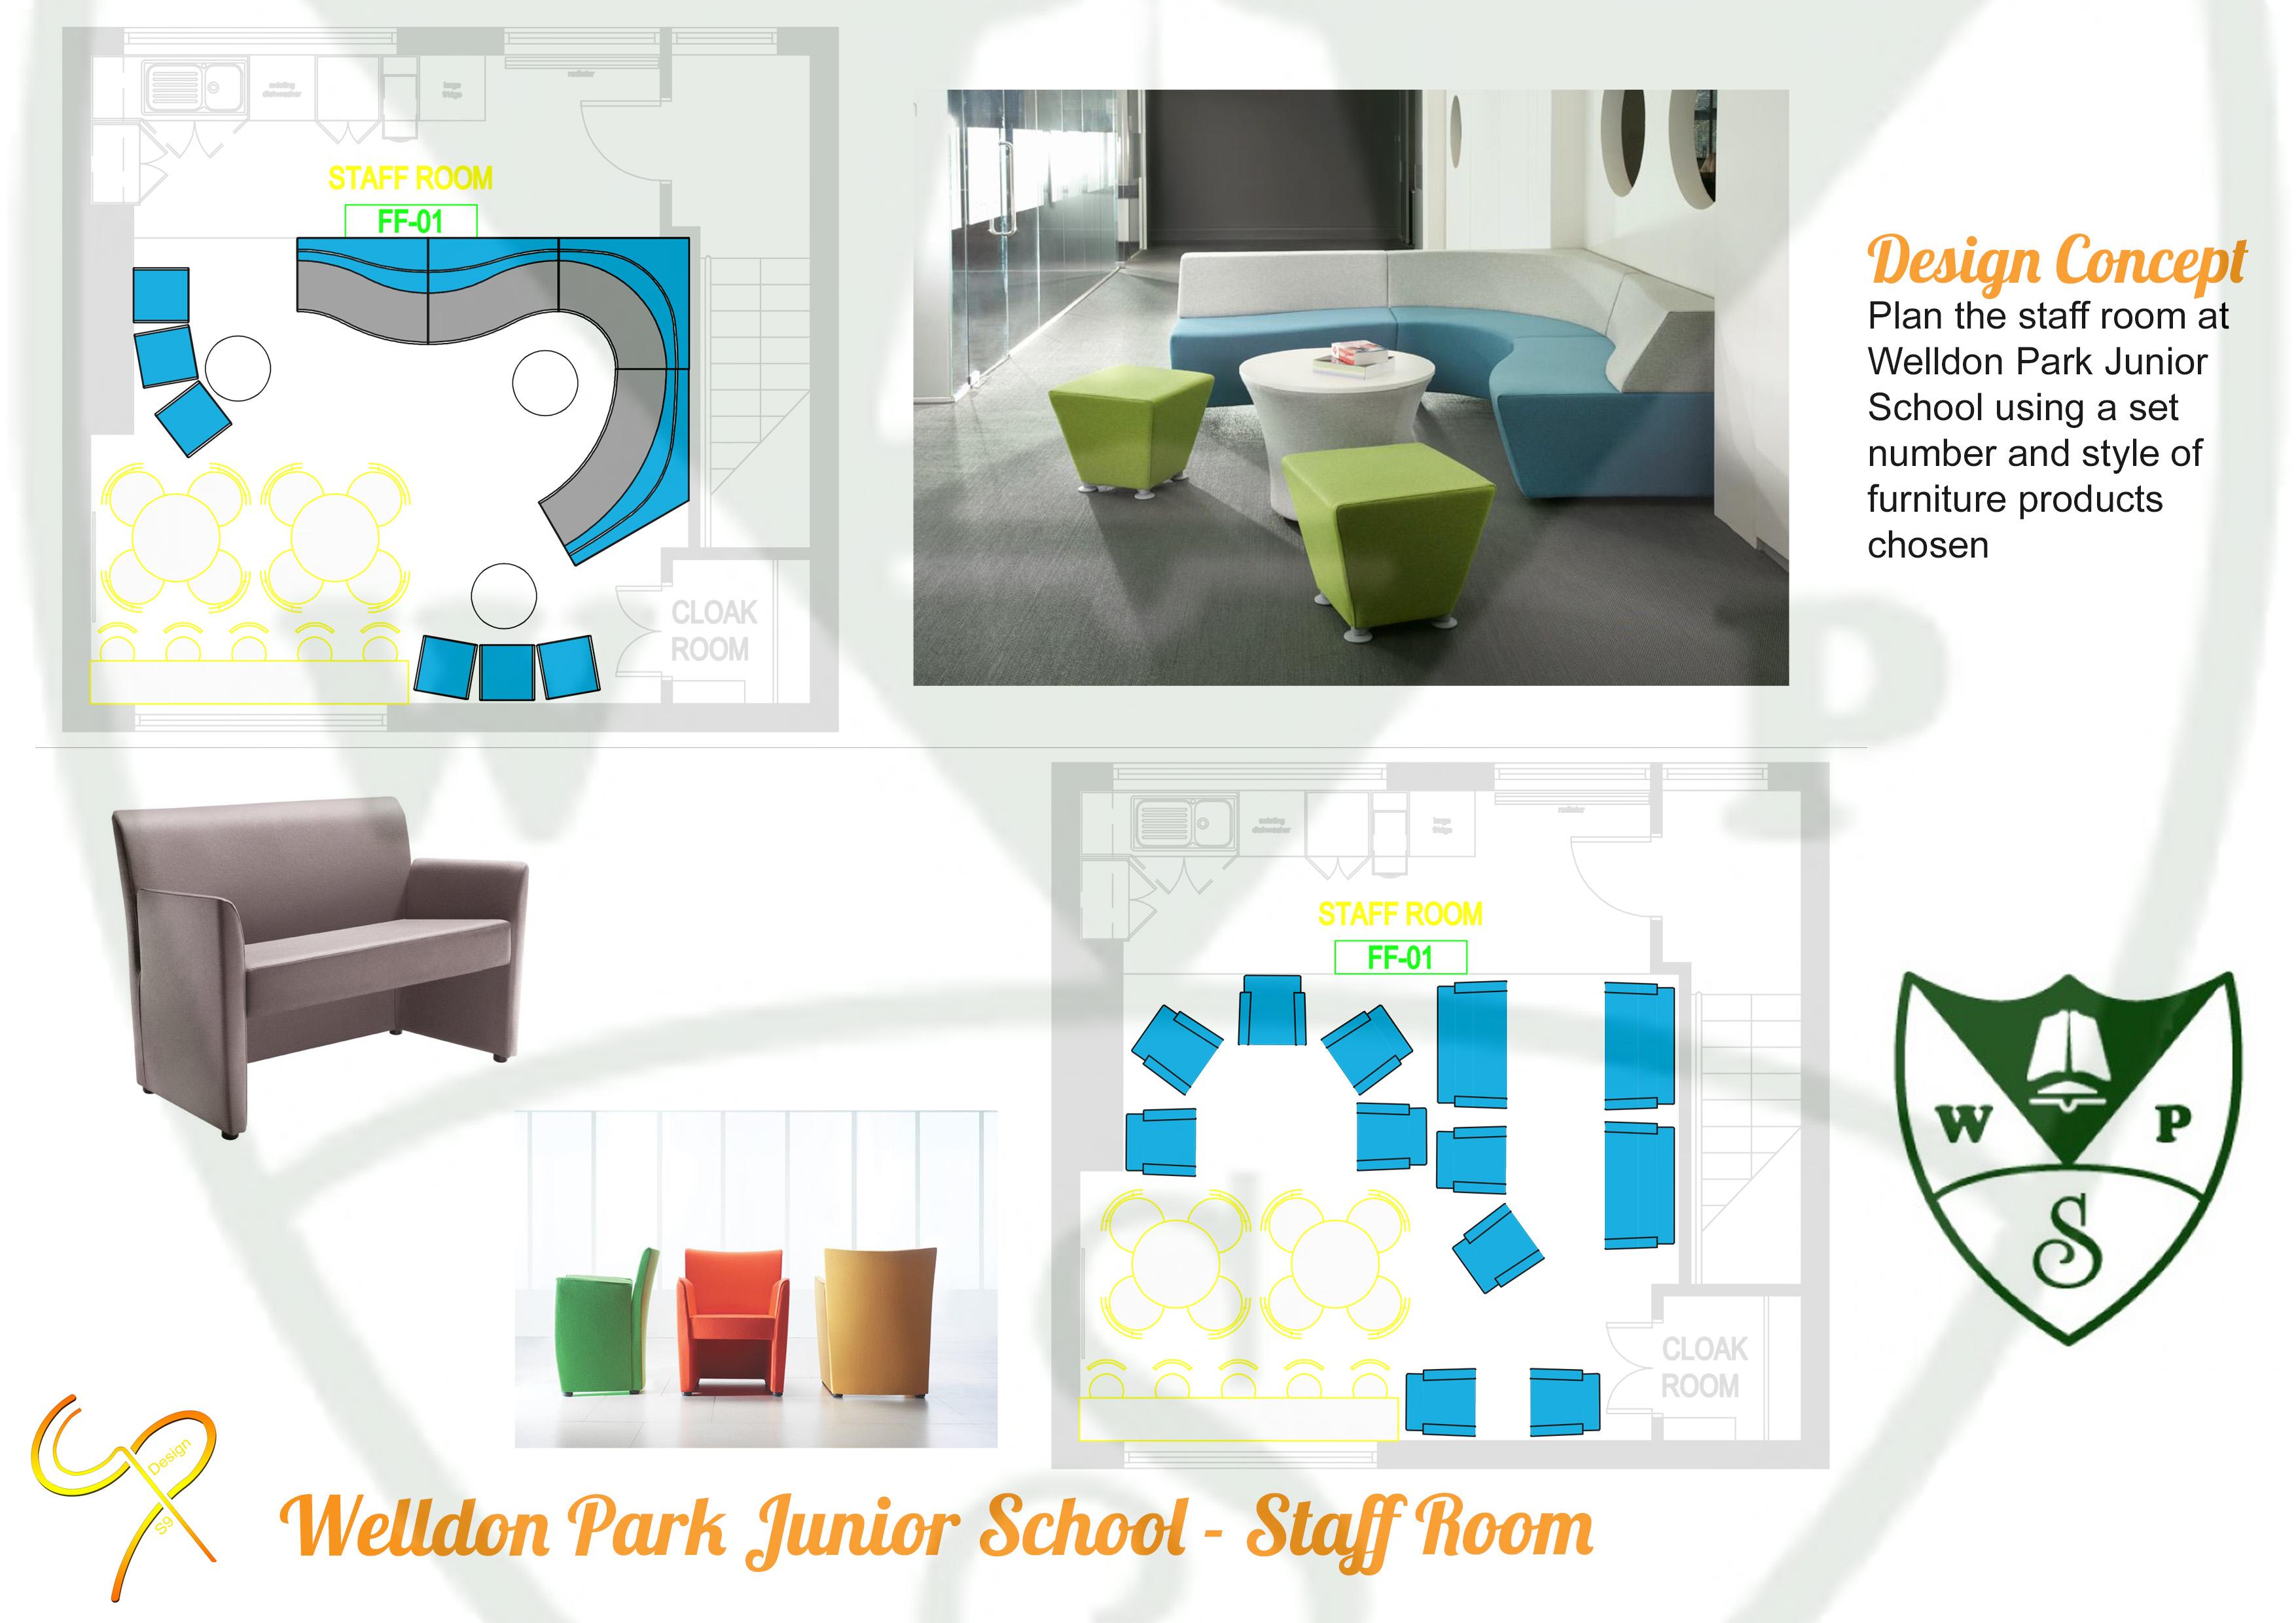 Welldon Park Junior School - Staff Room